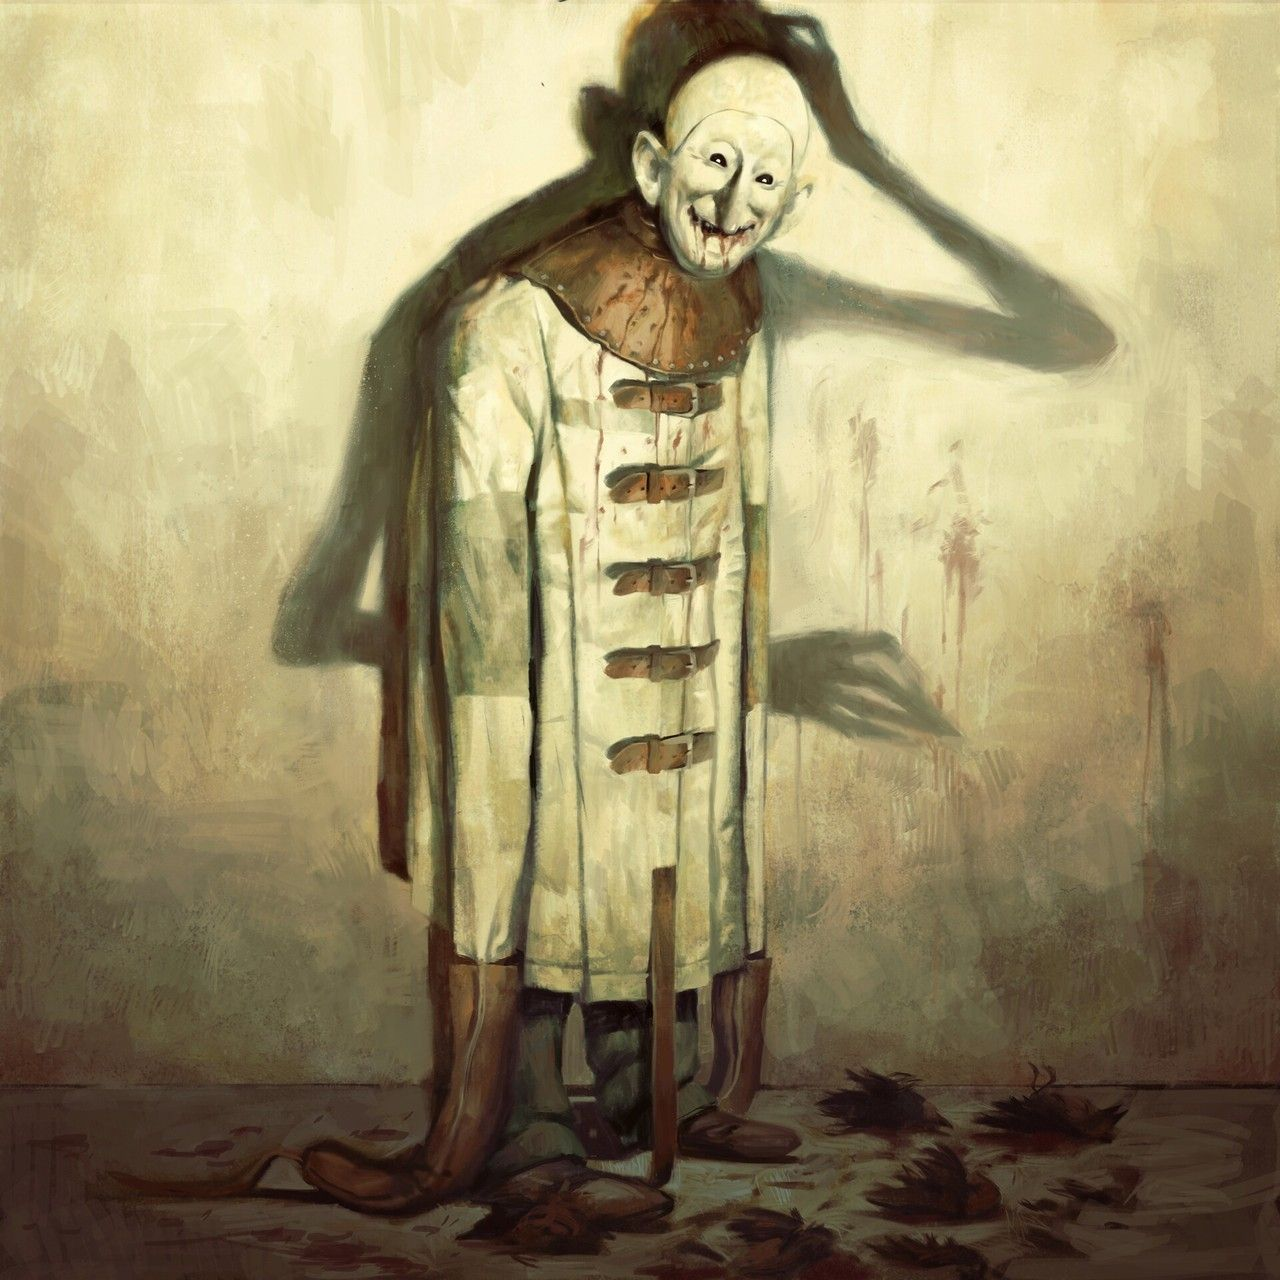 Scary Paintings, Horror, Creepy Art